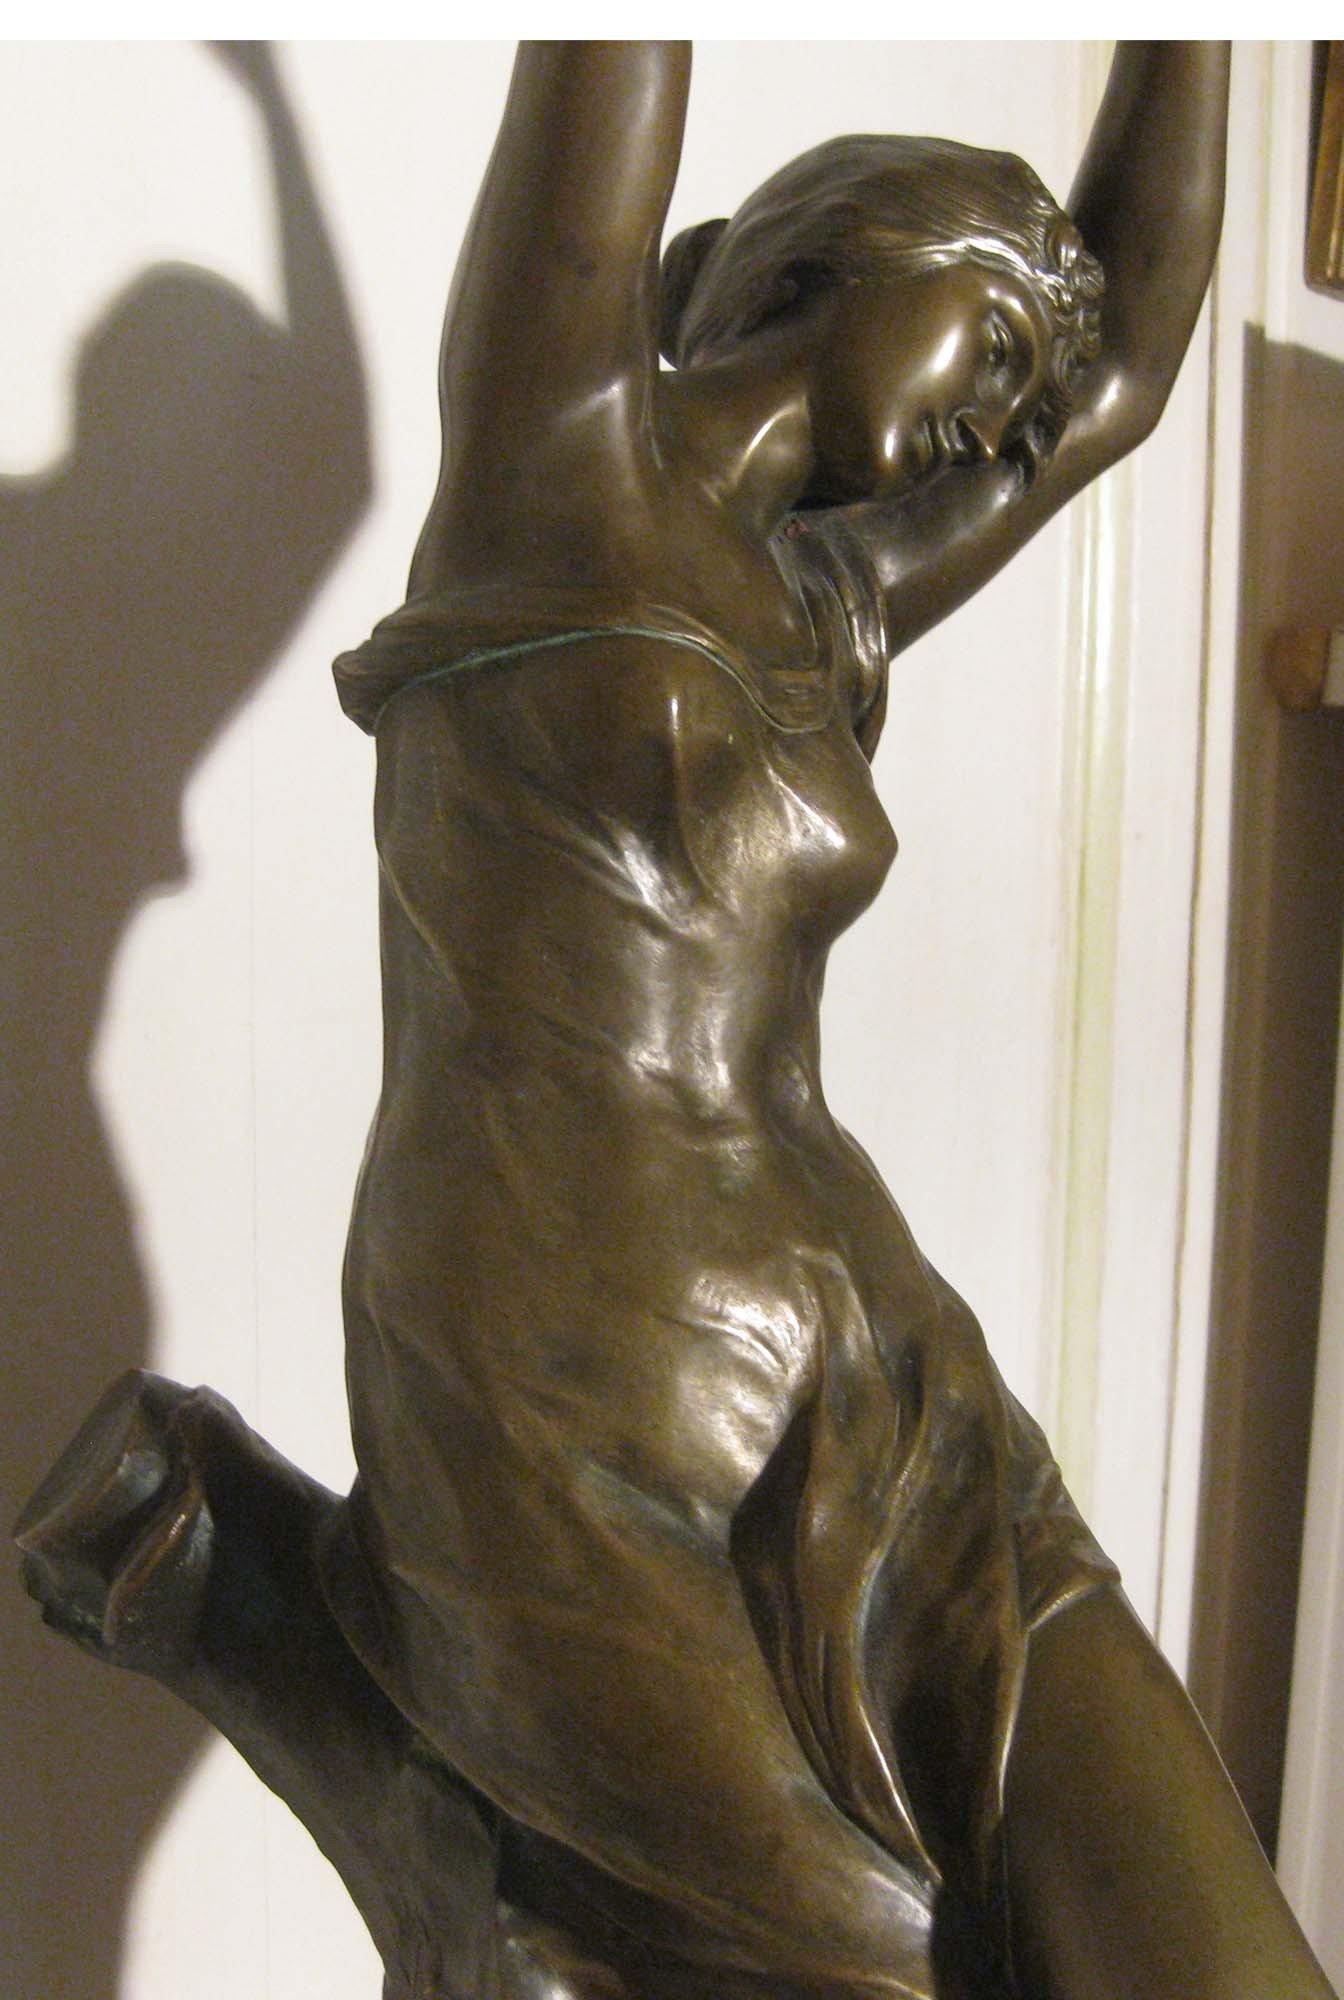 galerie-bosetti-antiquites, sculpture bronze L. MADRASSI , corps de la femme